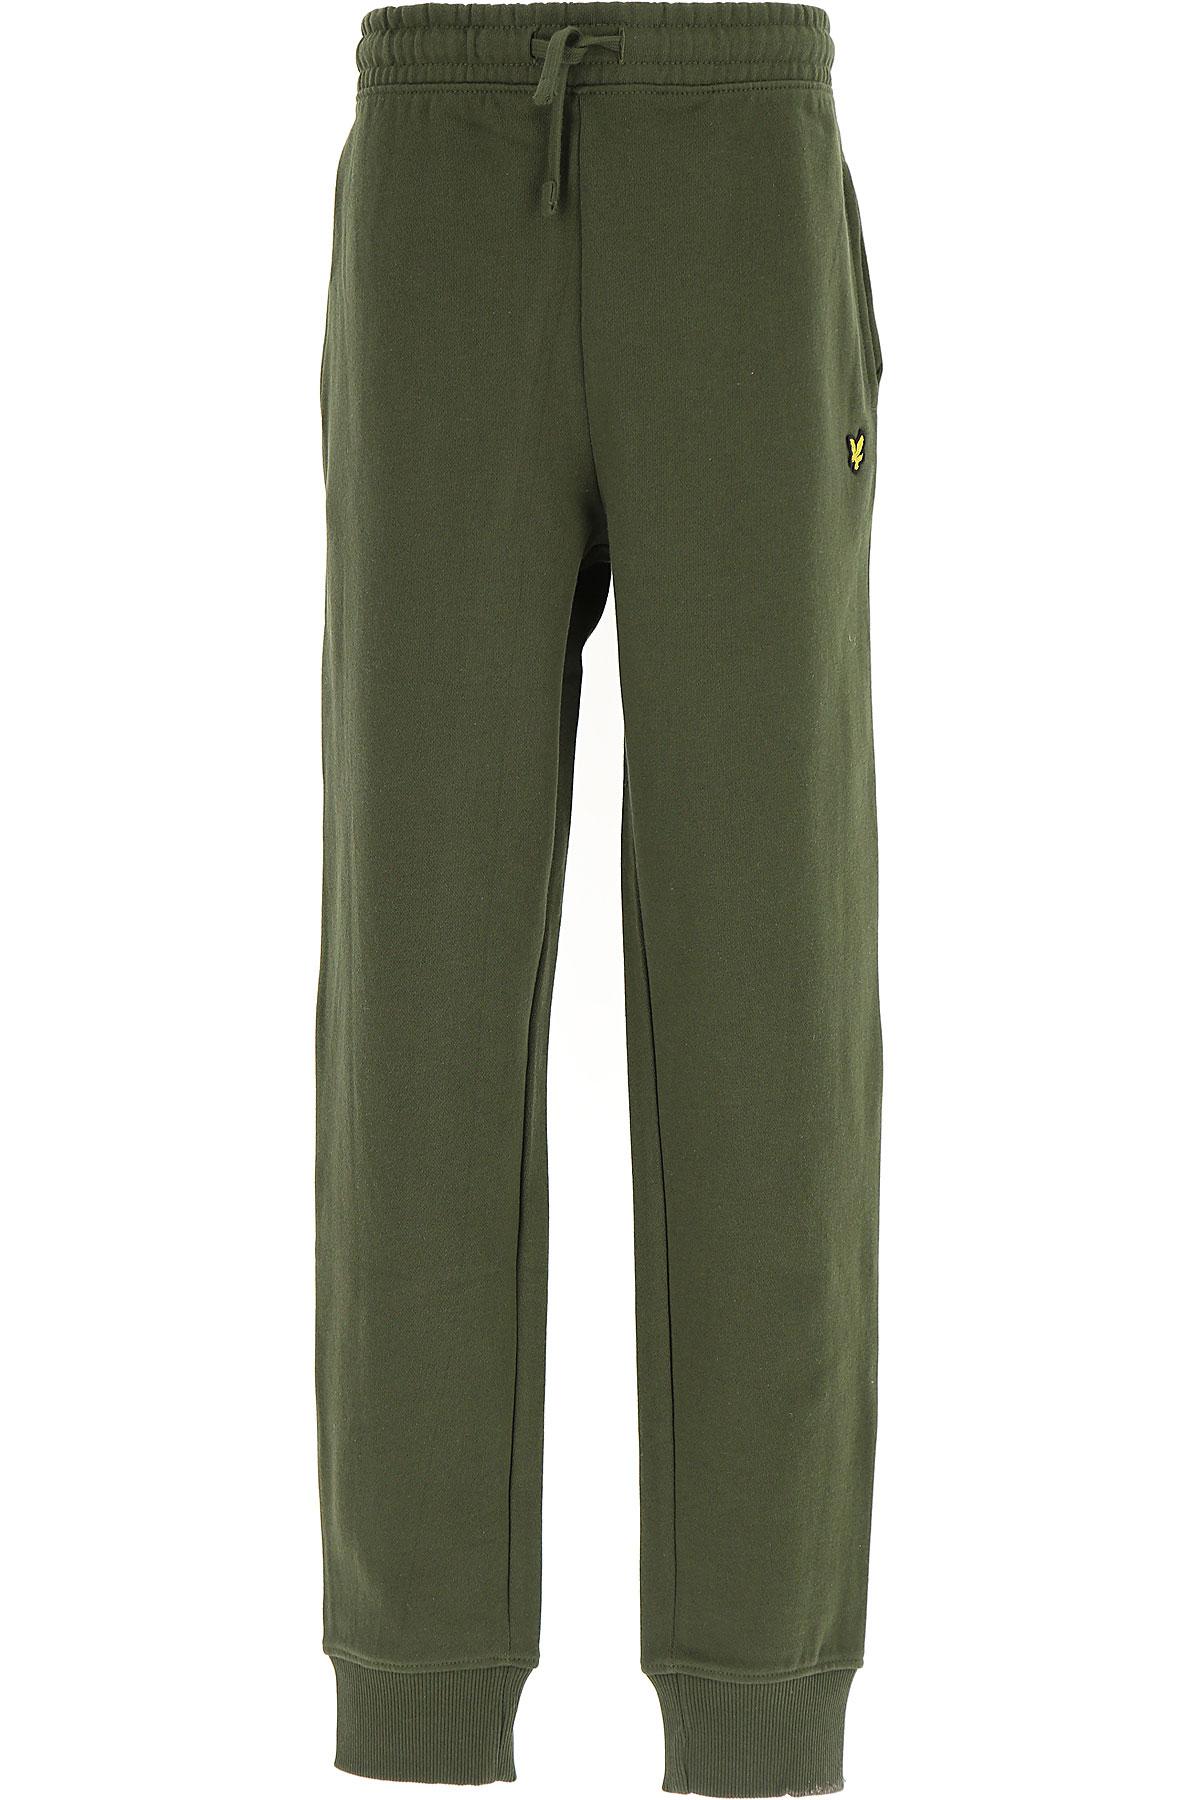 Image of Lyle & Scott Kids Sweatpants for Boys, Green, Cotton, 2017, 10Y 14Y 8Y